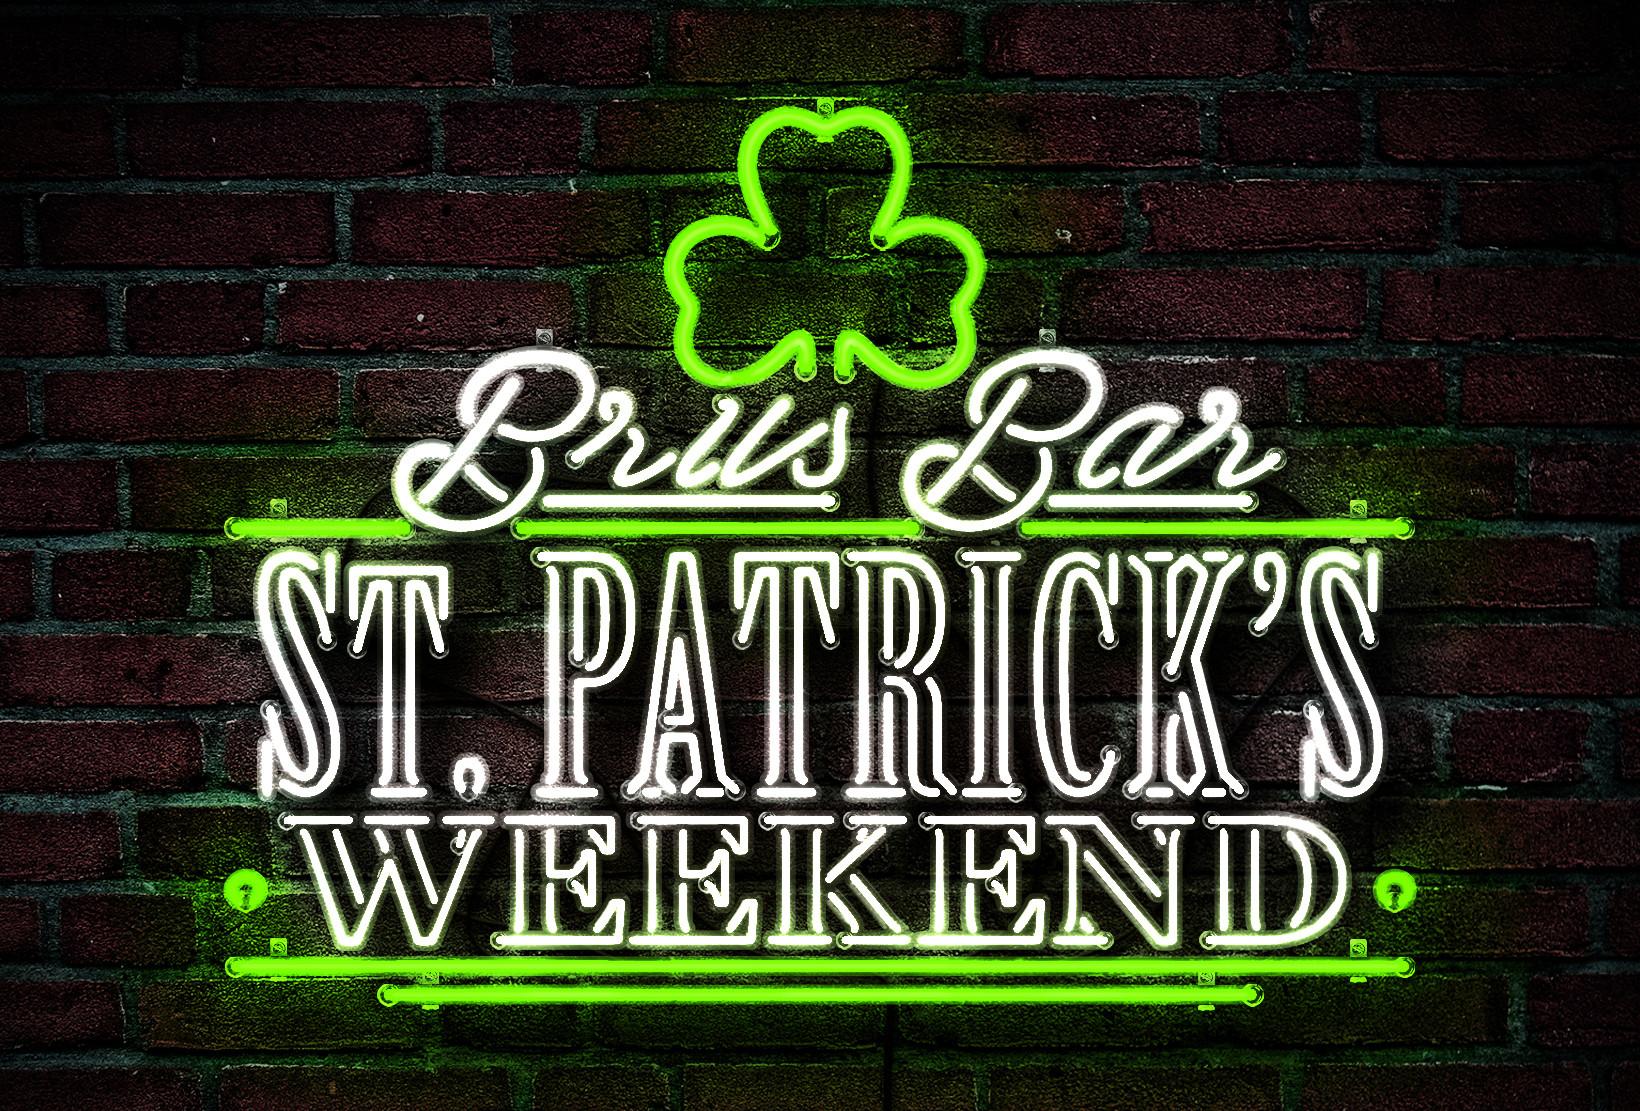 St Patrick's Weekend 2019 Logo - MP Grafica